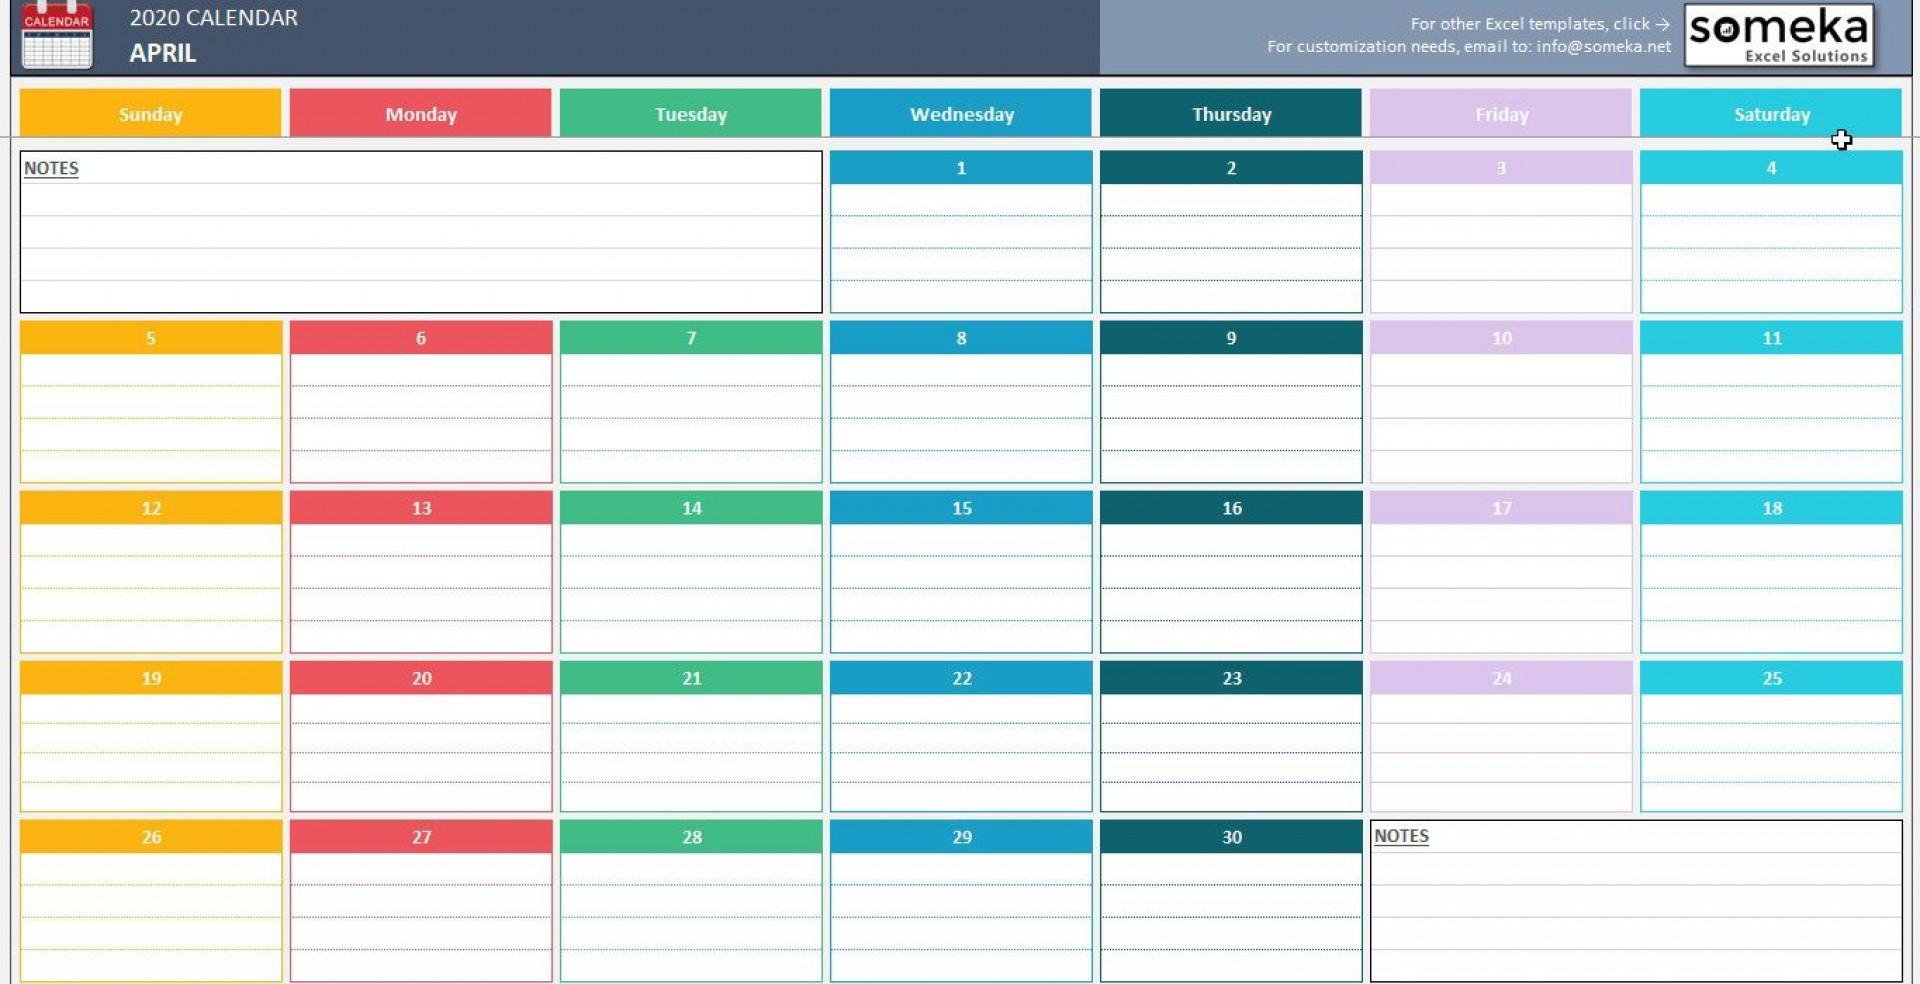 007 Top Calendar 2020 Template Excel Sample  Monthly Free Uk In Format Download1920